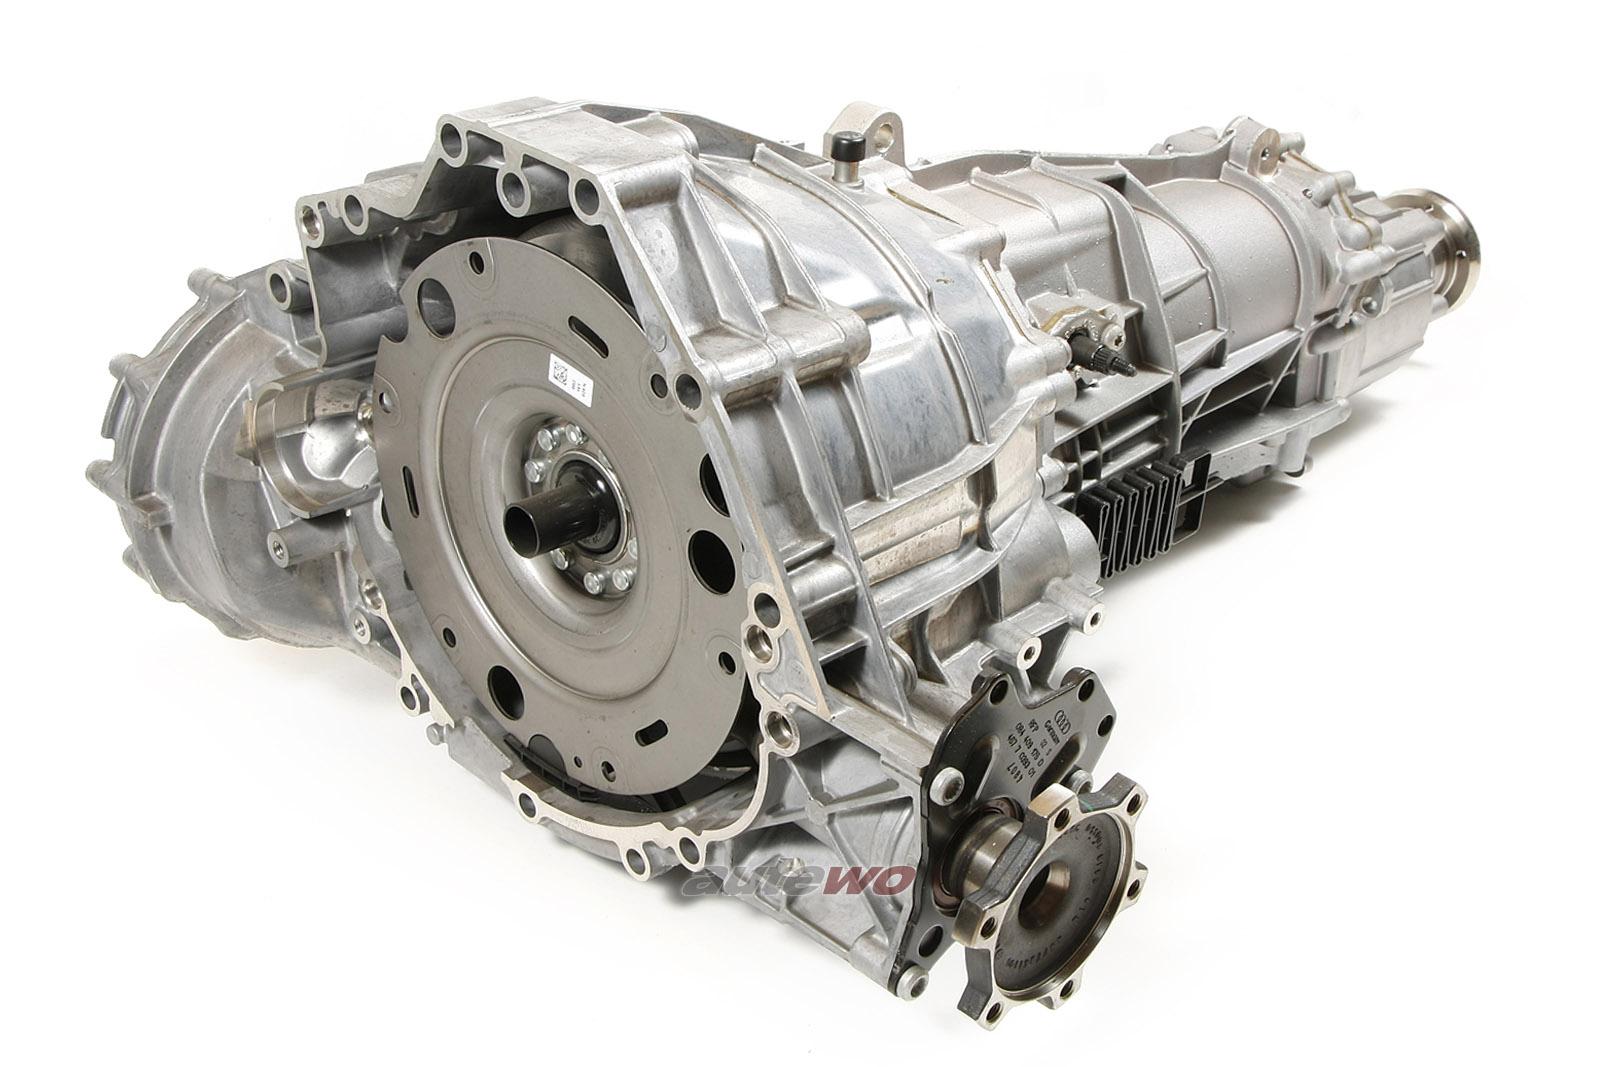 0B2300040EX NEU Audi A4 8K/B8/A5 8T 3.2l FSI 6-Gang-Schaltgetriebe Quattro HRQ